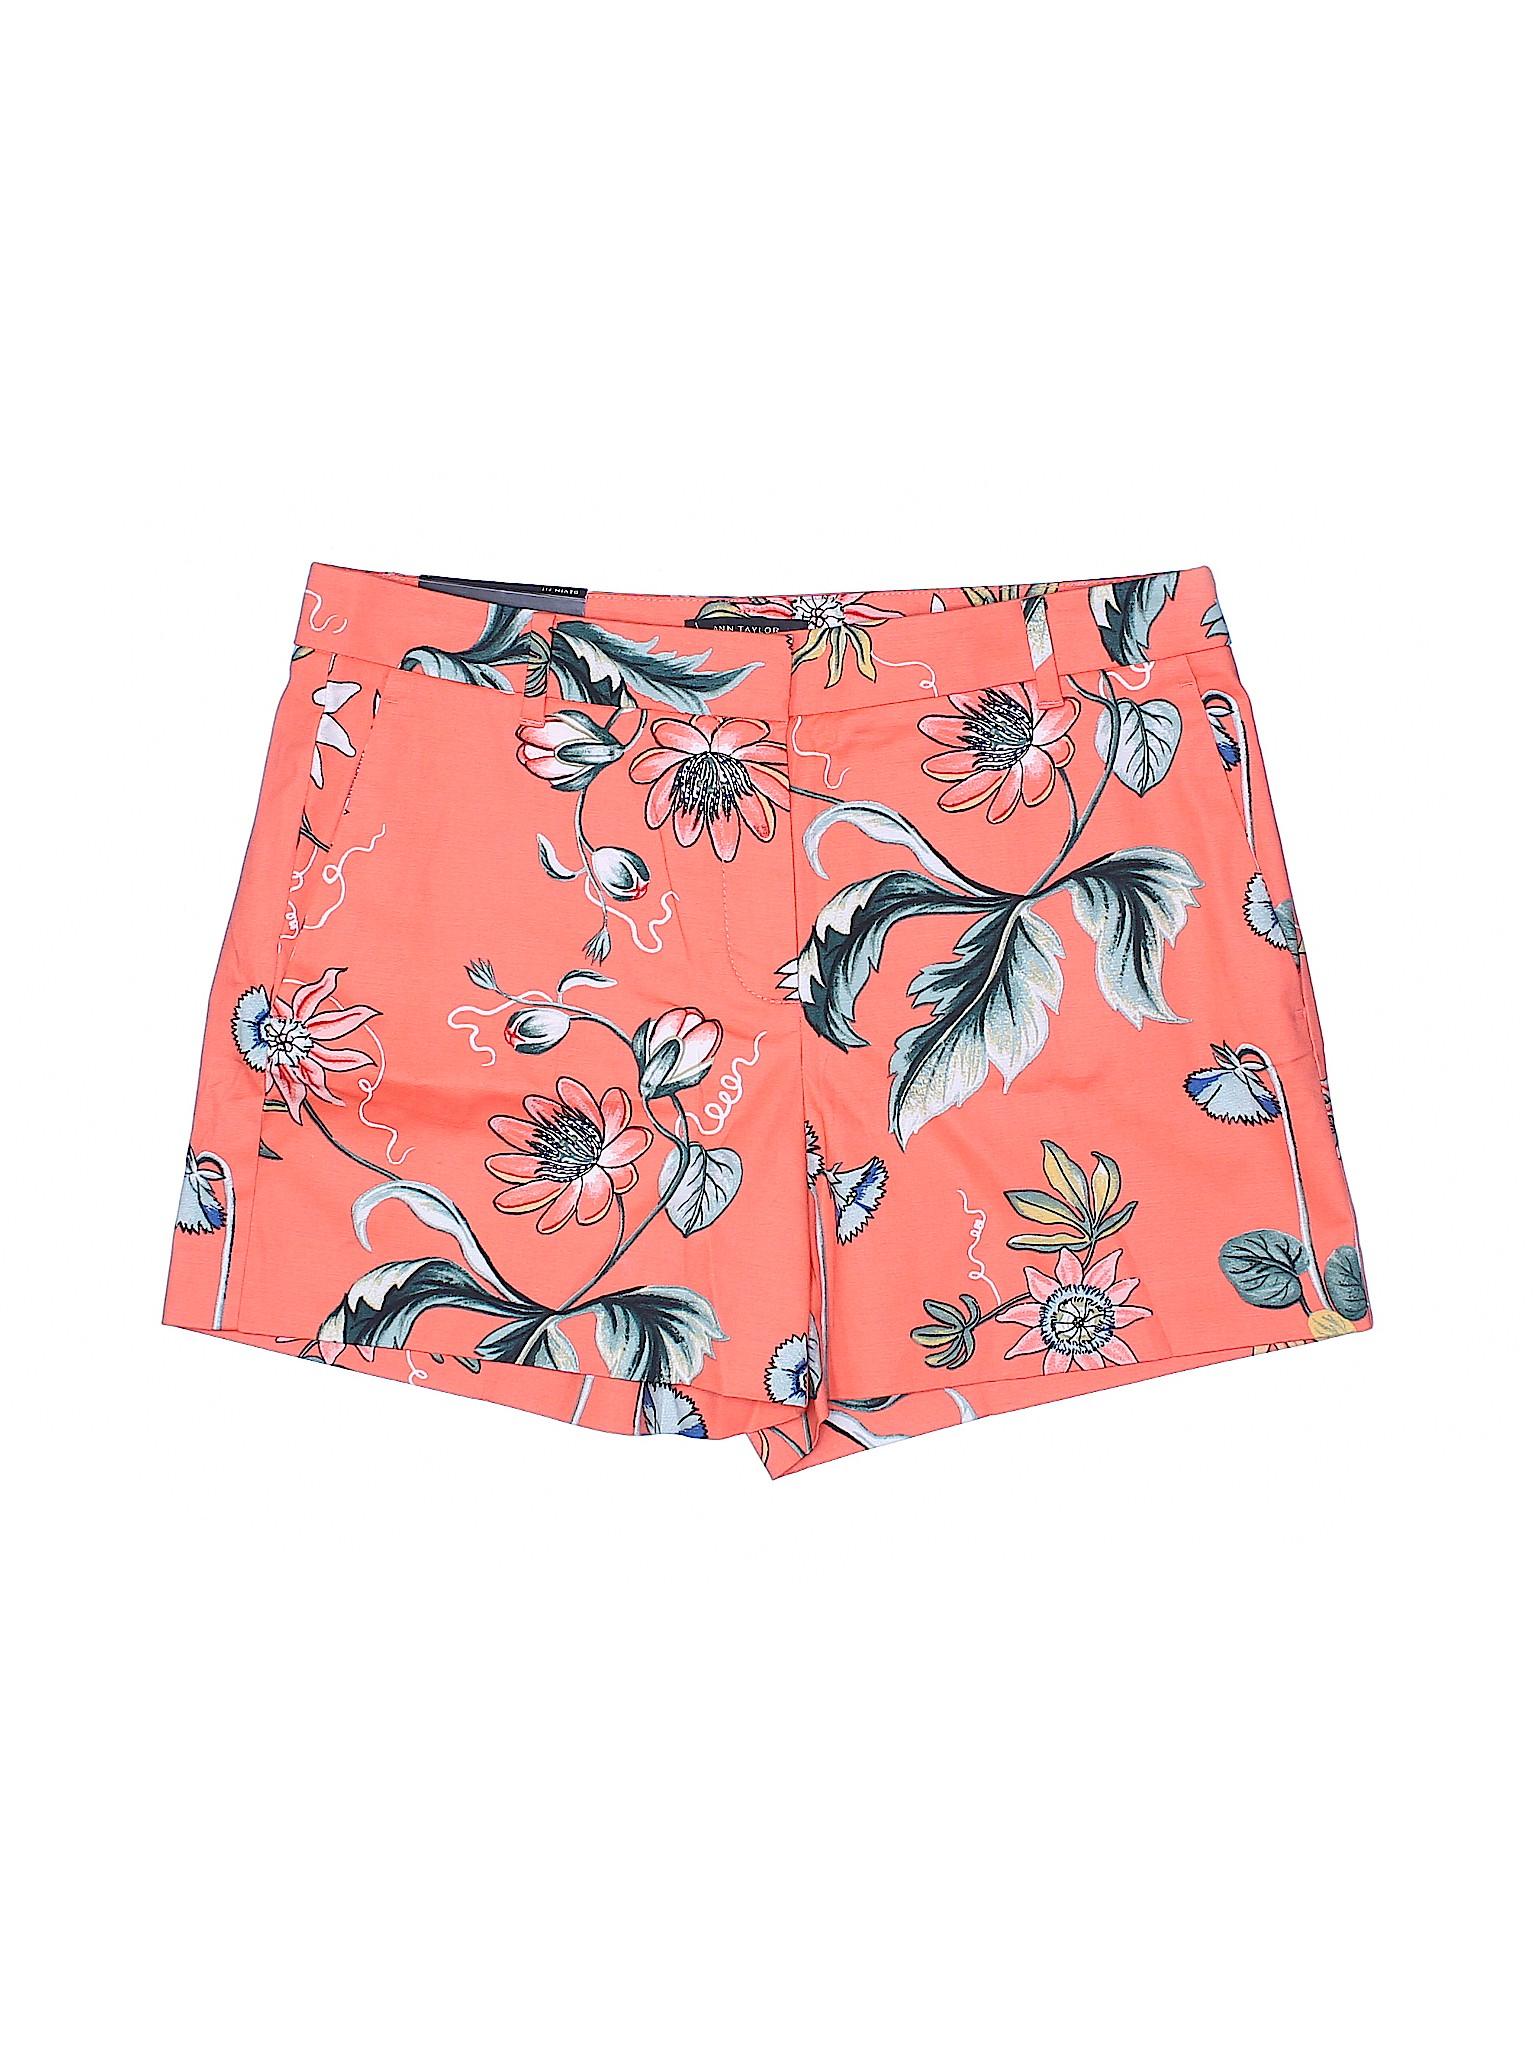 Taylor Boutique Taylor Boutique Khaki Taylor Ann Shorts Boutique Ann Ann Shorts Khaki Shorts Khaki SEarqE